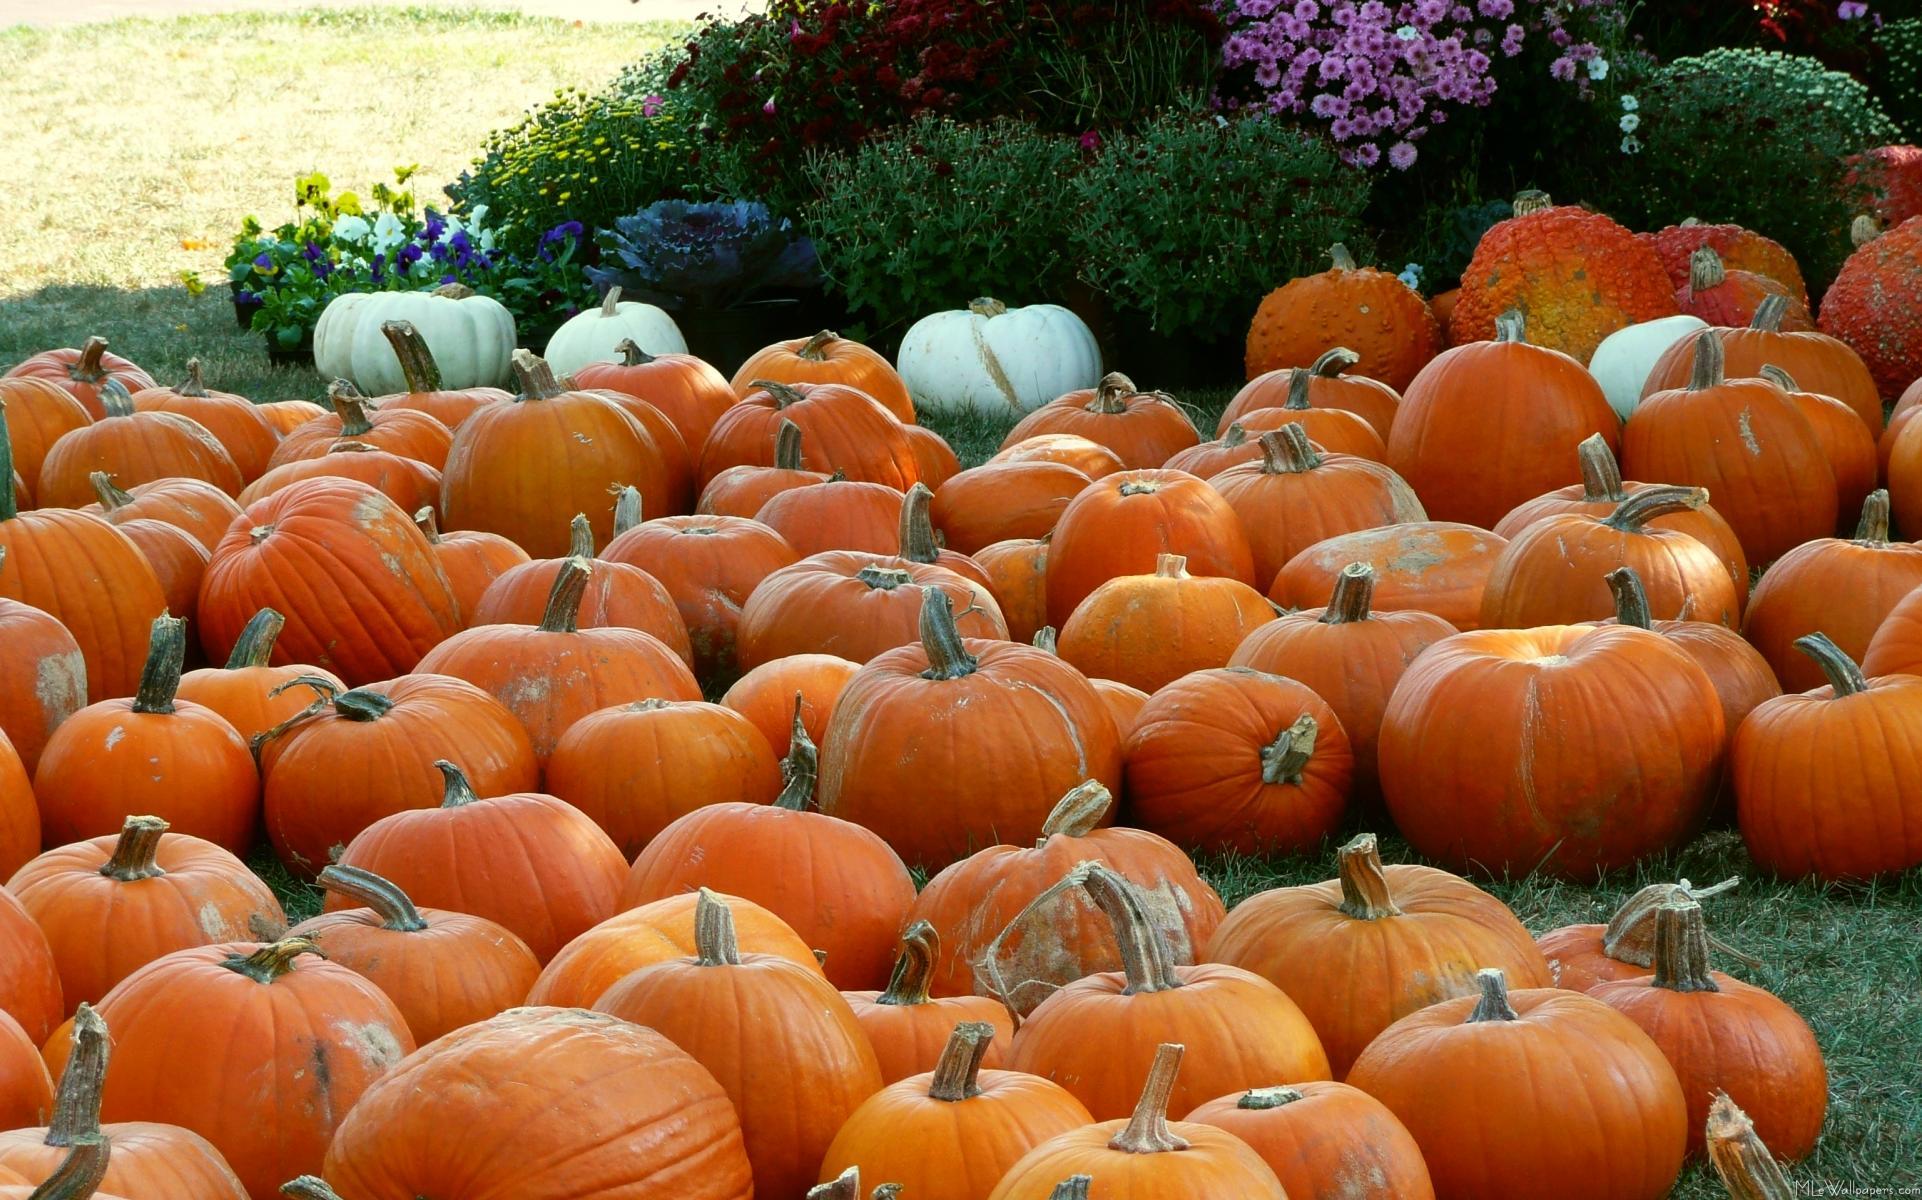 Fall Harvest Desktop Wallpaper Mlewallpapers Com Pumpkins And Mums